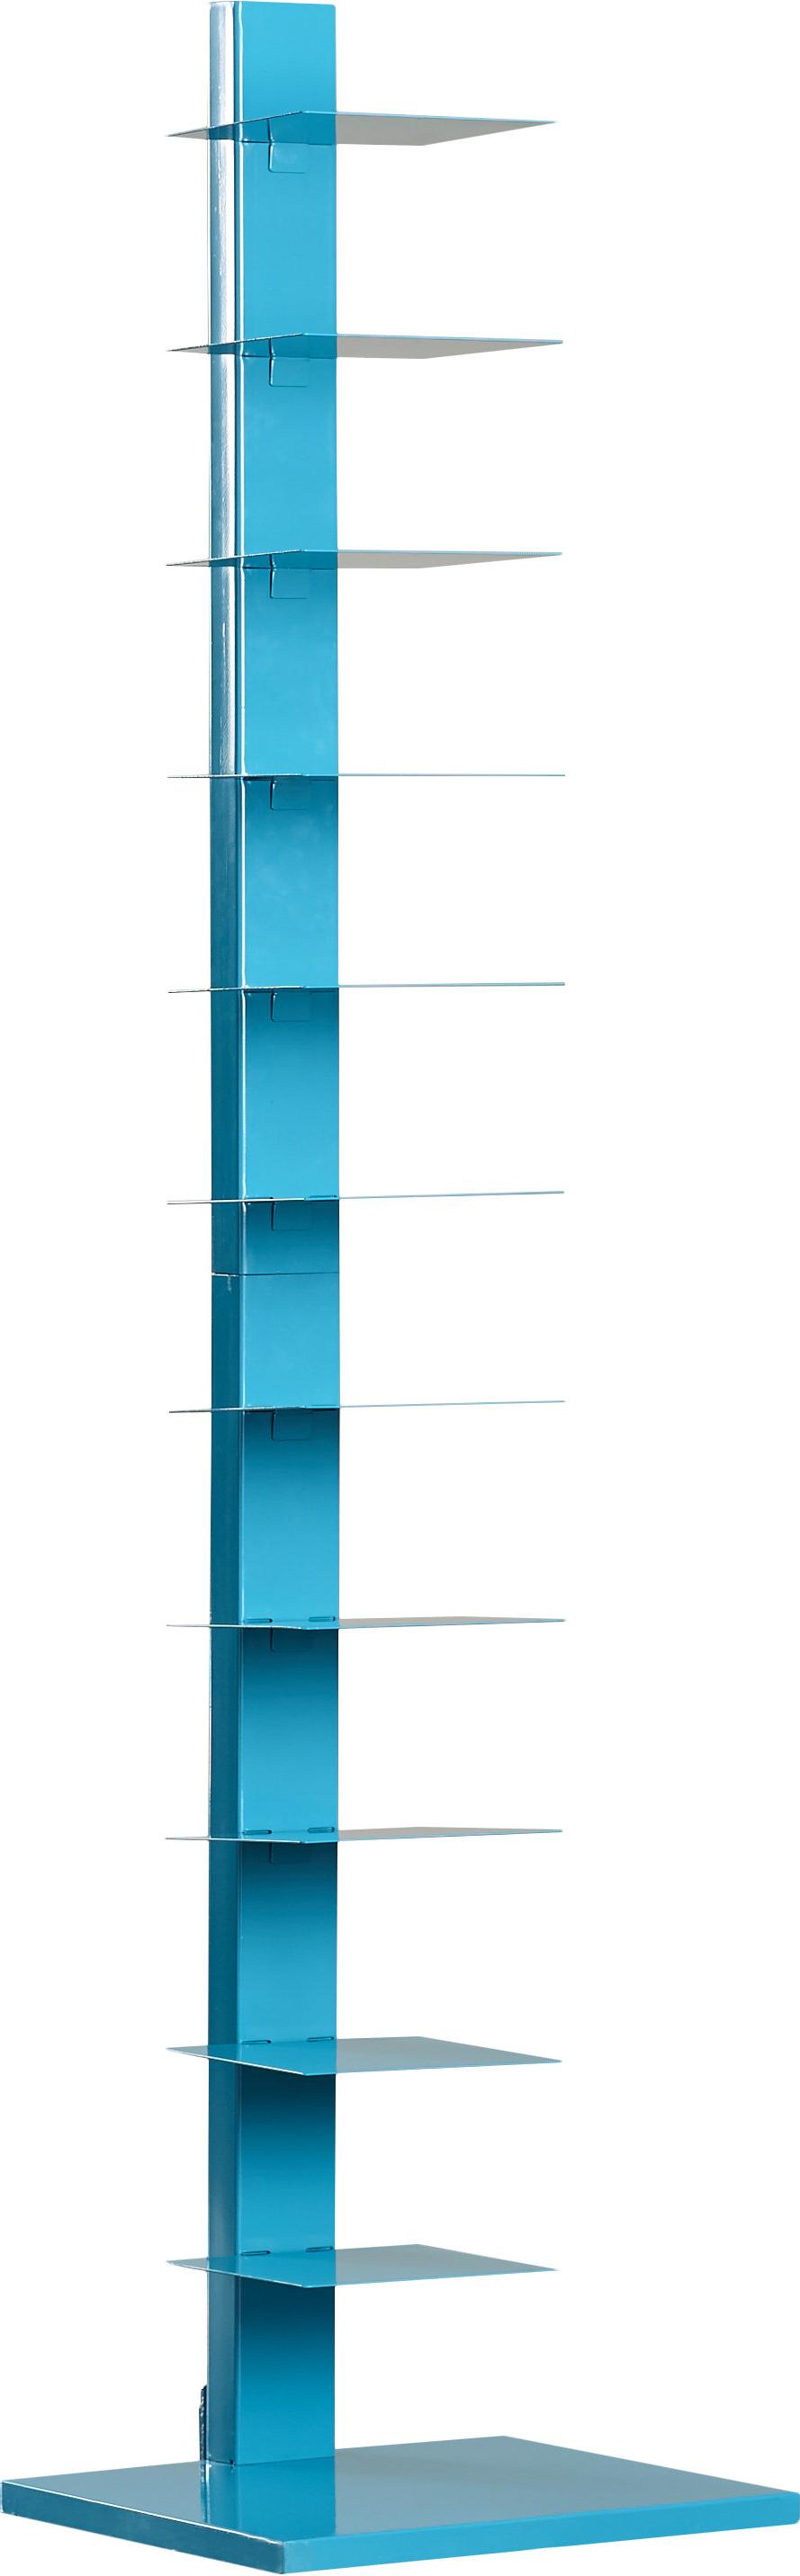 Mercury Row Xanthe Standard Bookcase Within Current Xanthe Standard Bookcases (View 6 of 20)